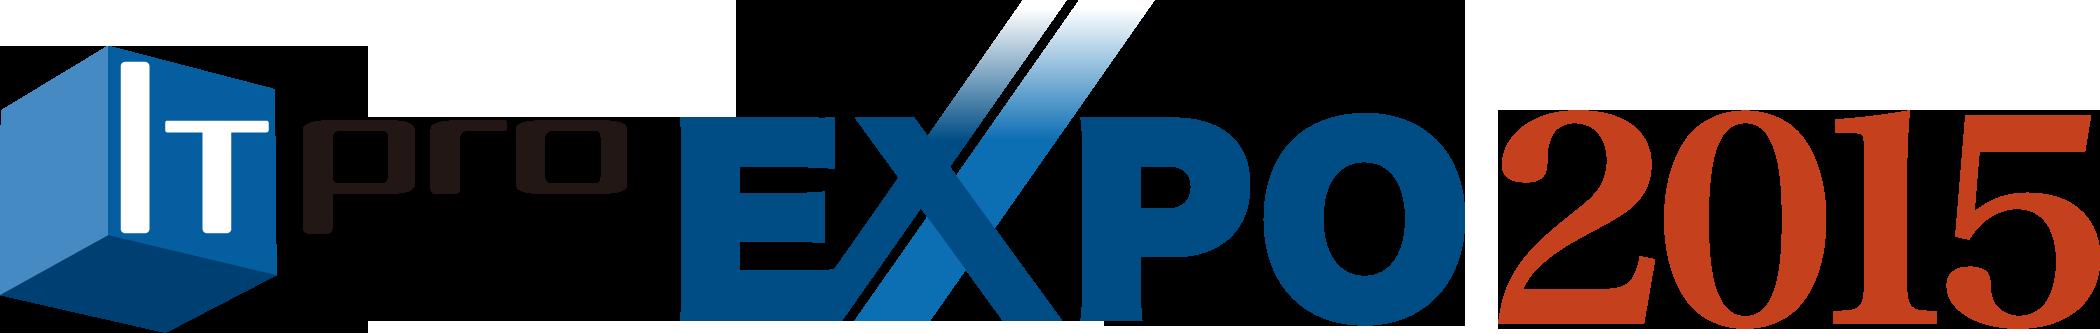 ITproEXPO2015_1L